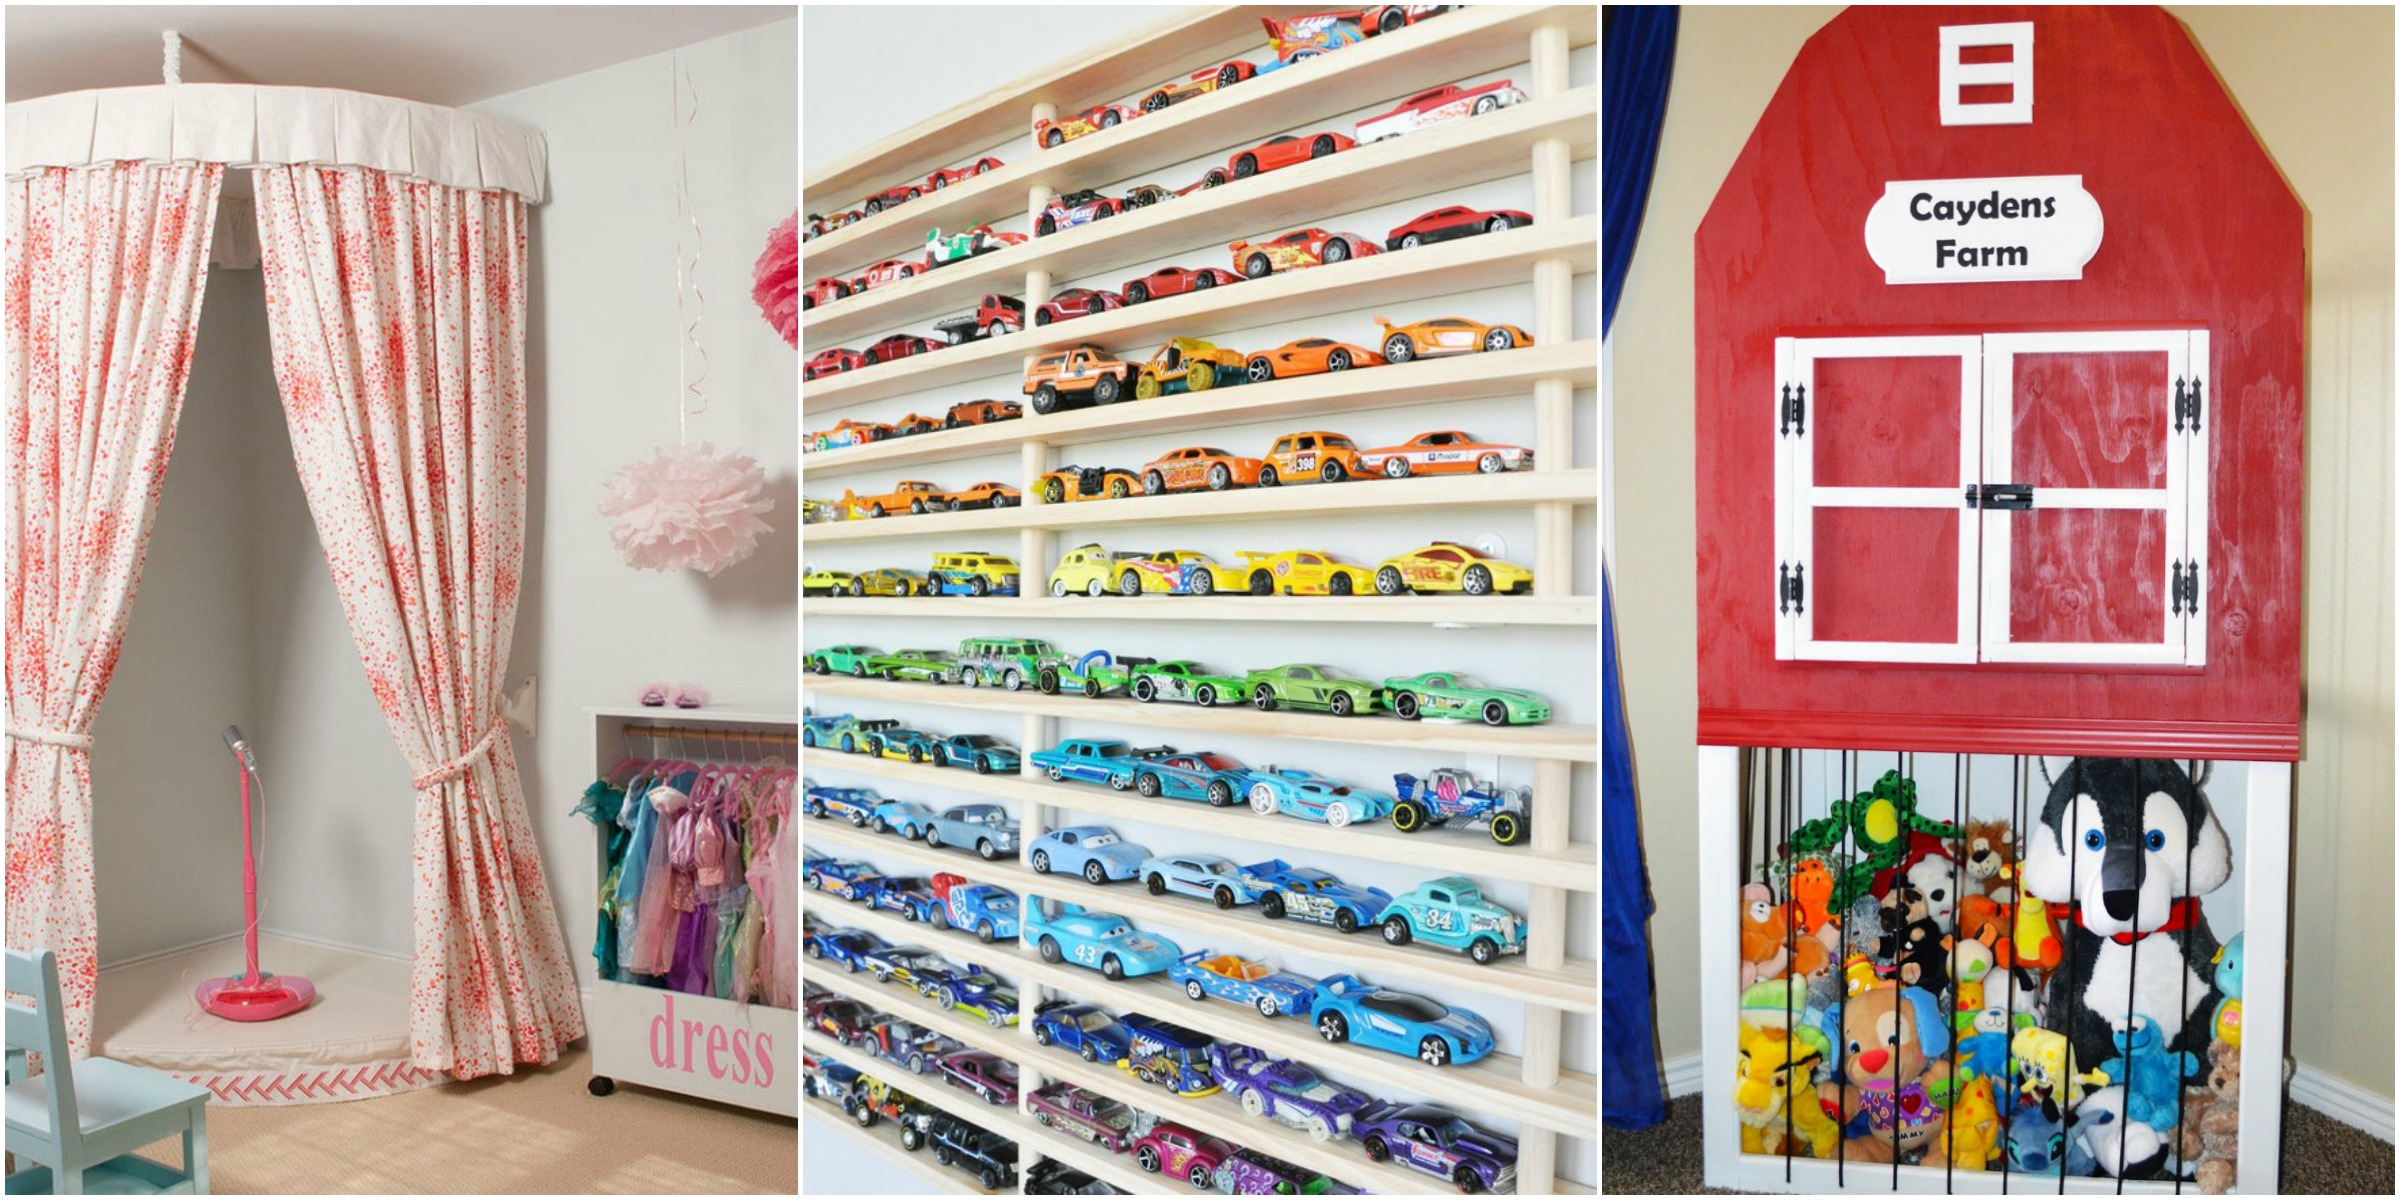 Stylish toy storage ideas how to organize toys for Small room toy storage ideas